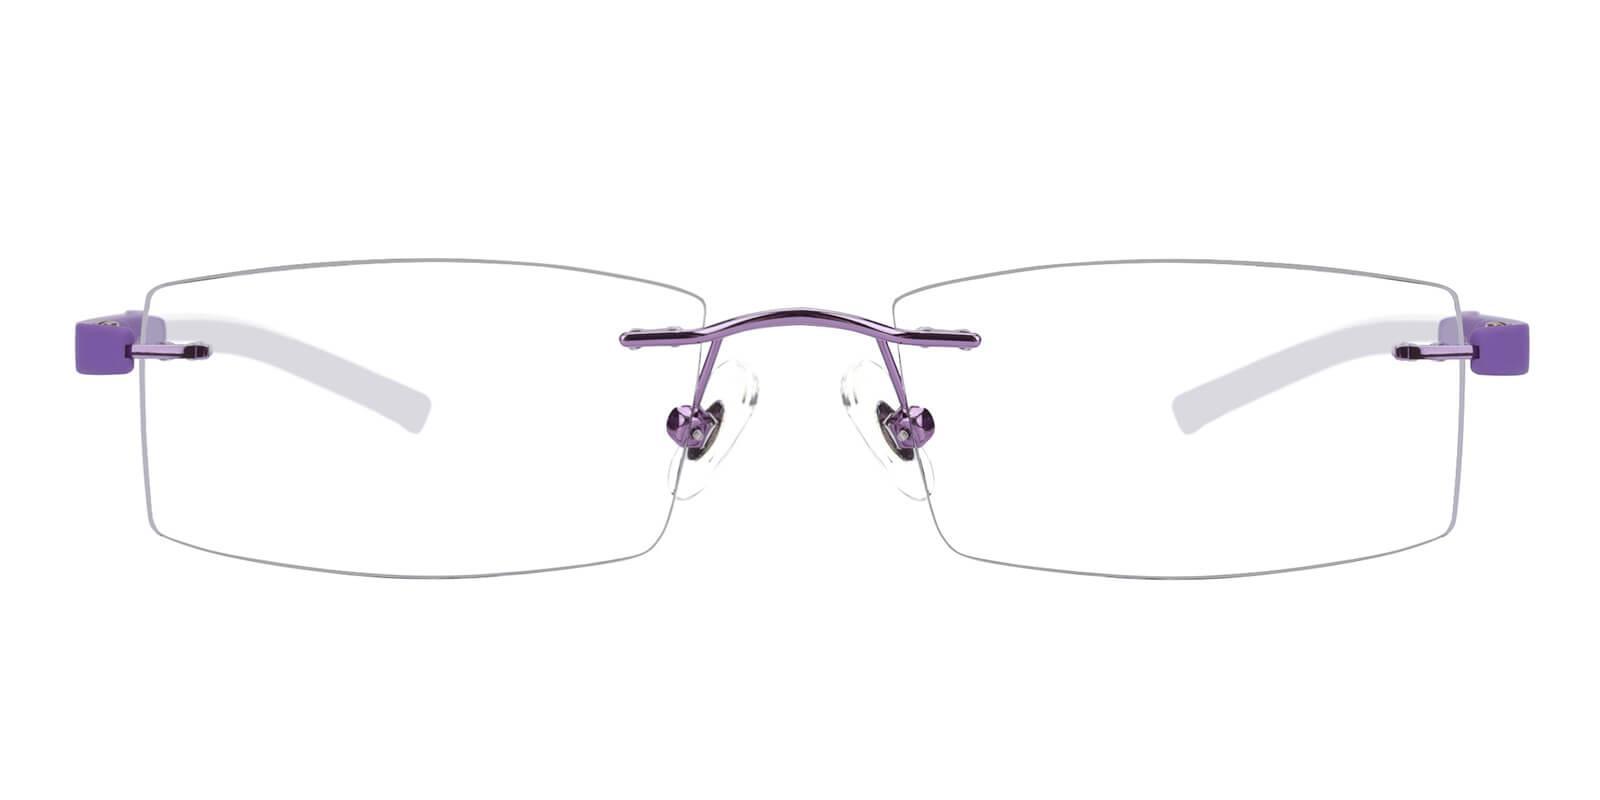 Trimming-Purple-Varieties-Acetate / Metal-Eyeglasses-additional2